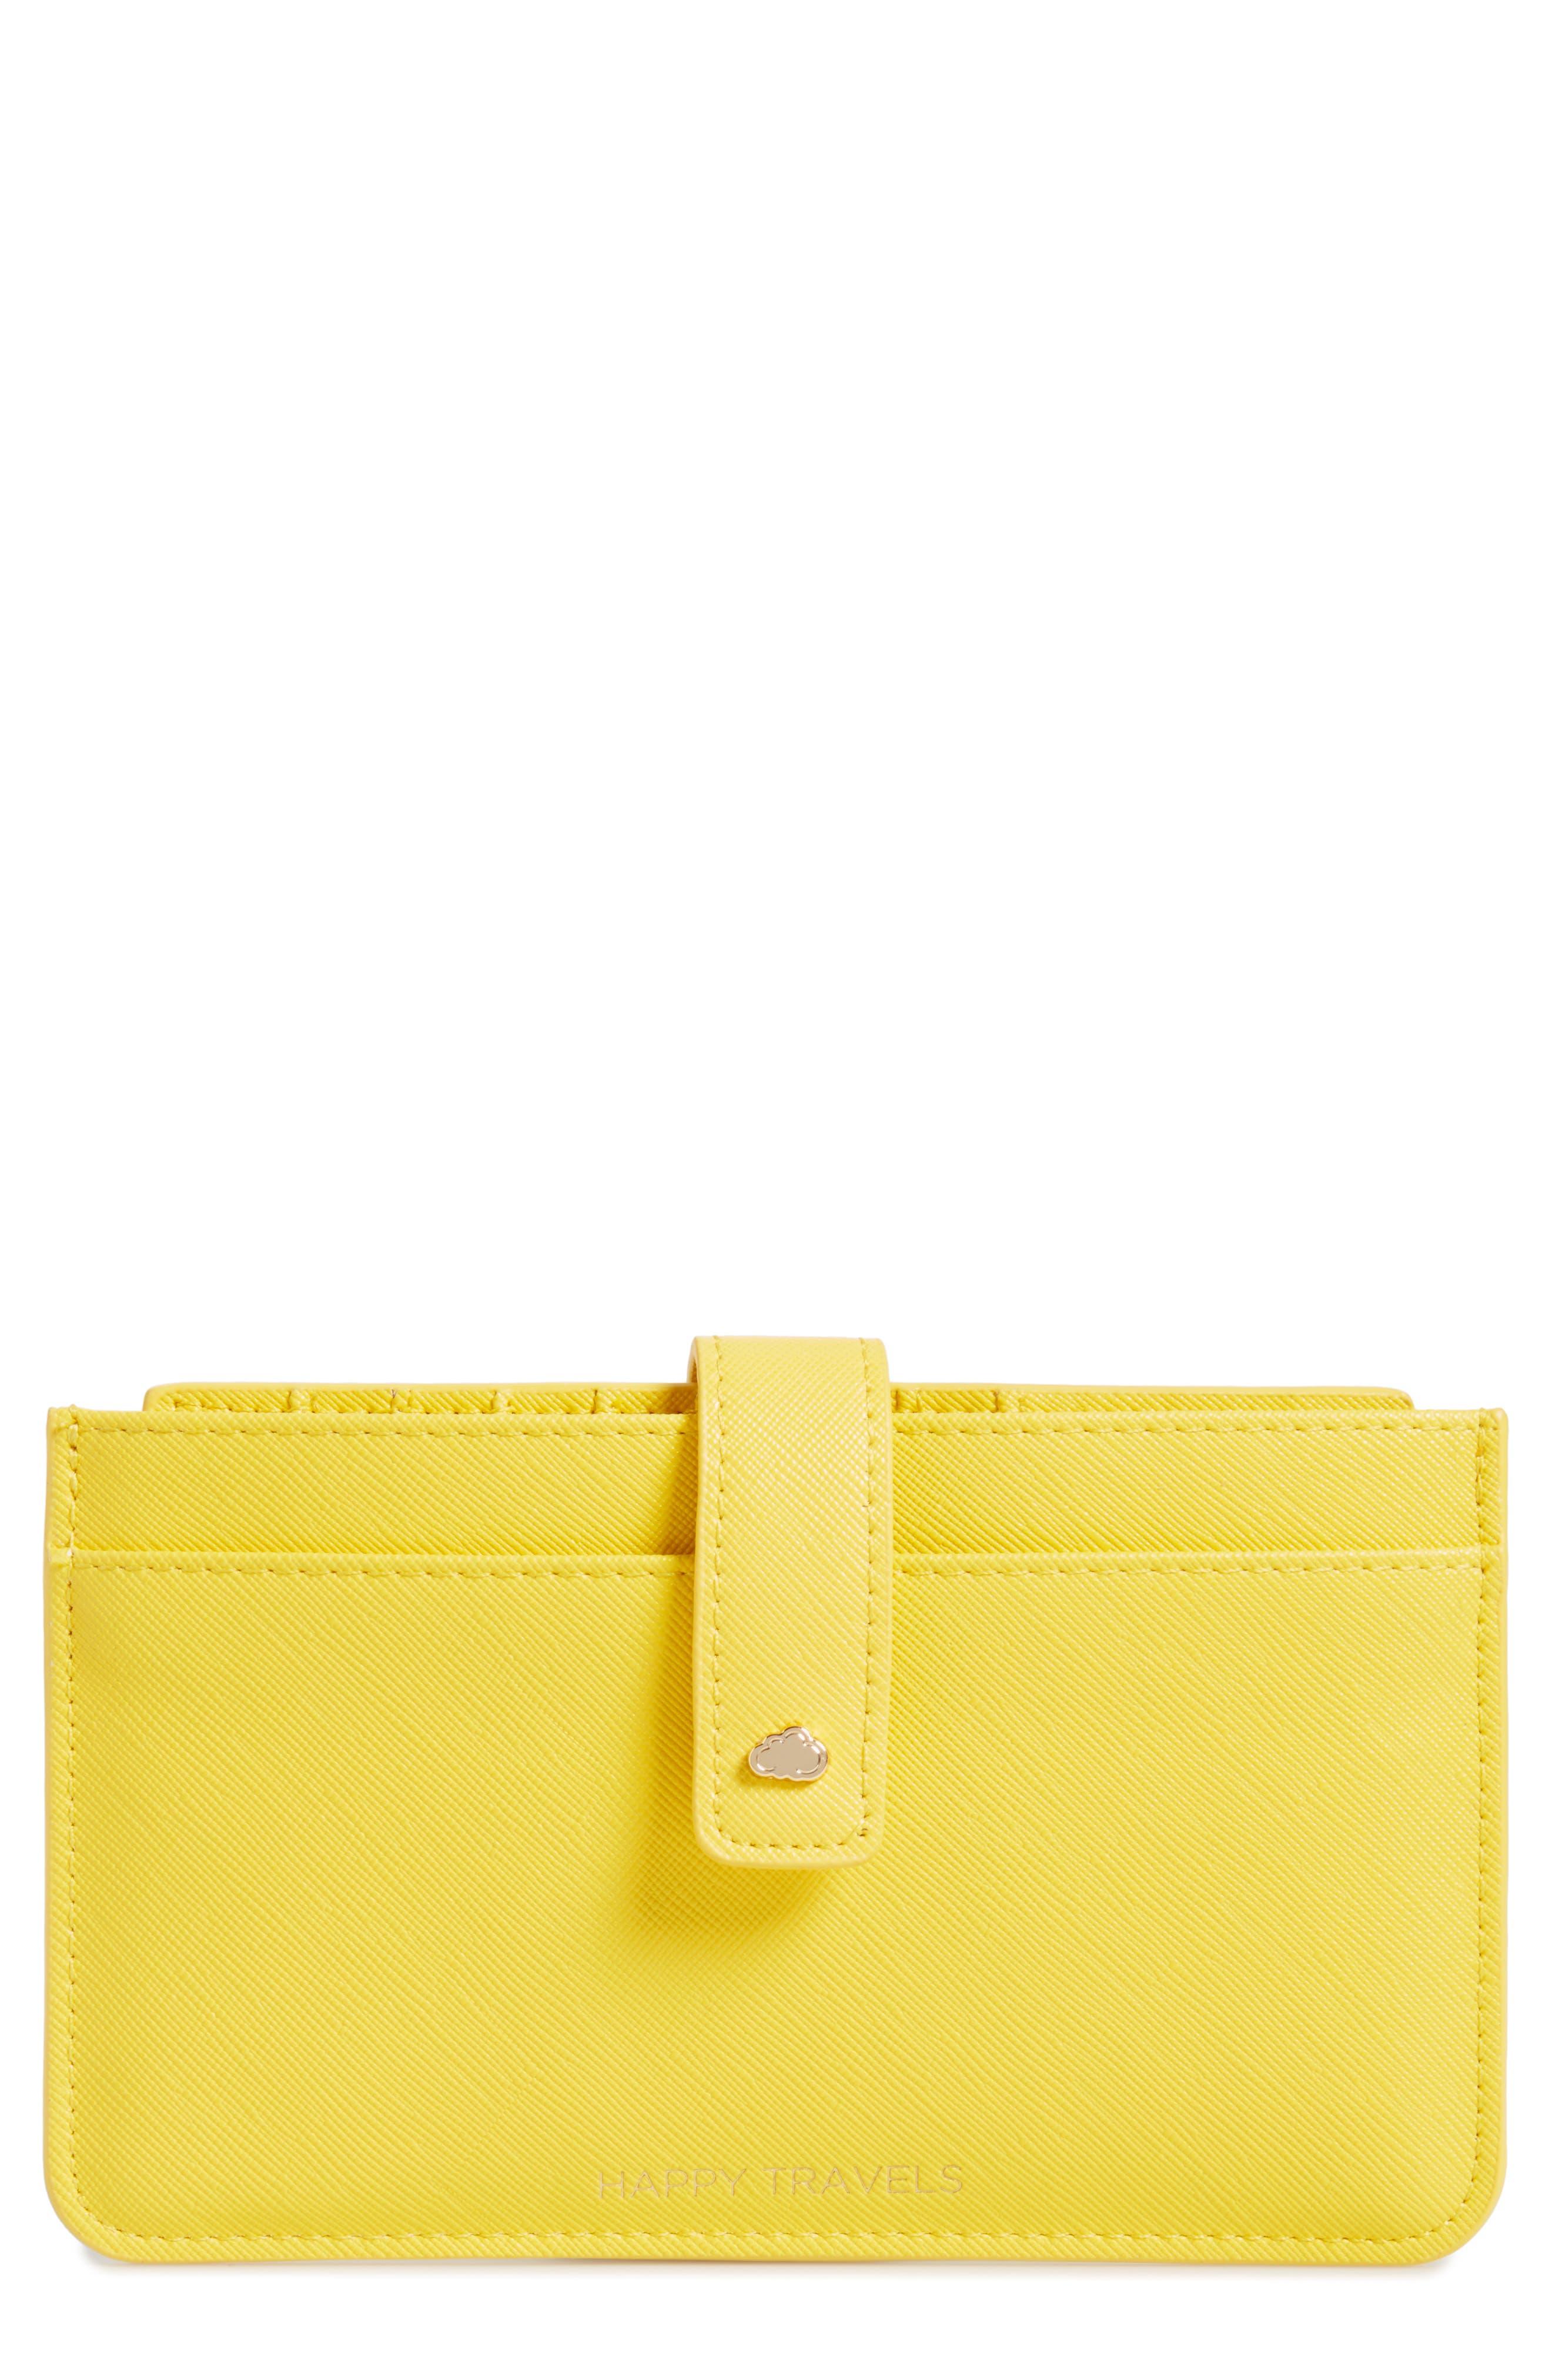 Estella Bartlett Happy Travels Faux Leather Document Wallet